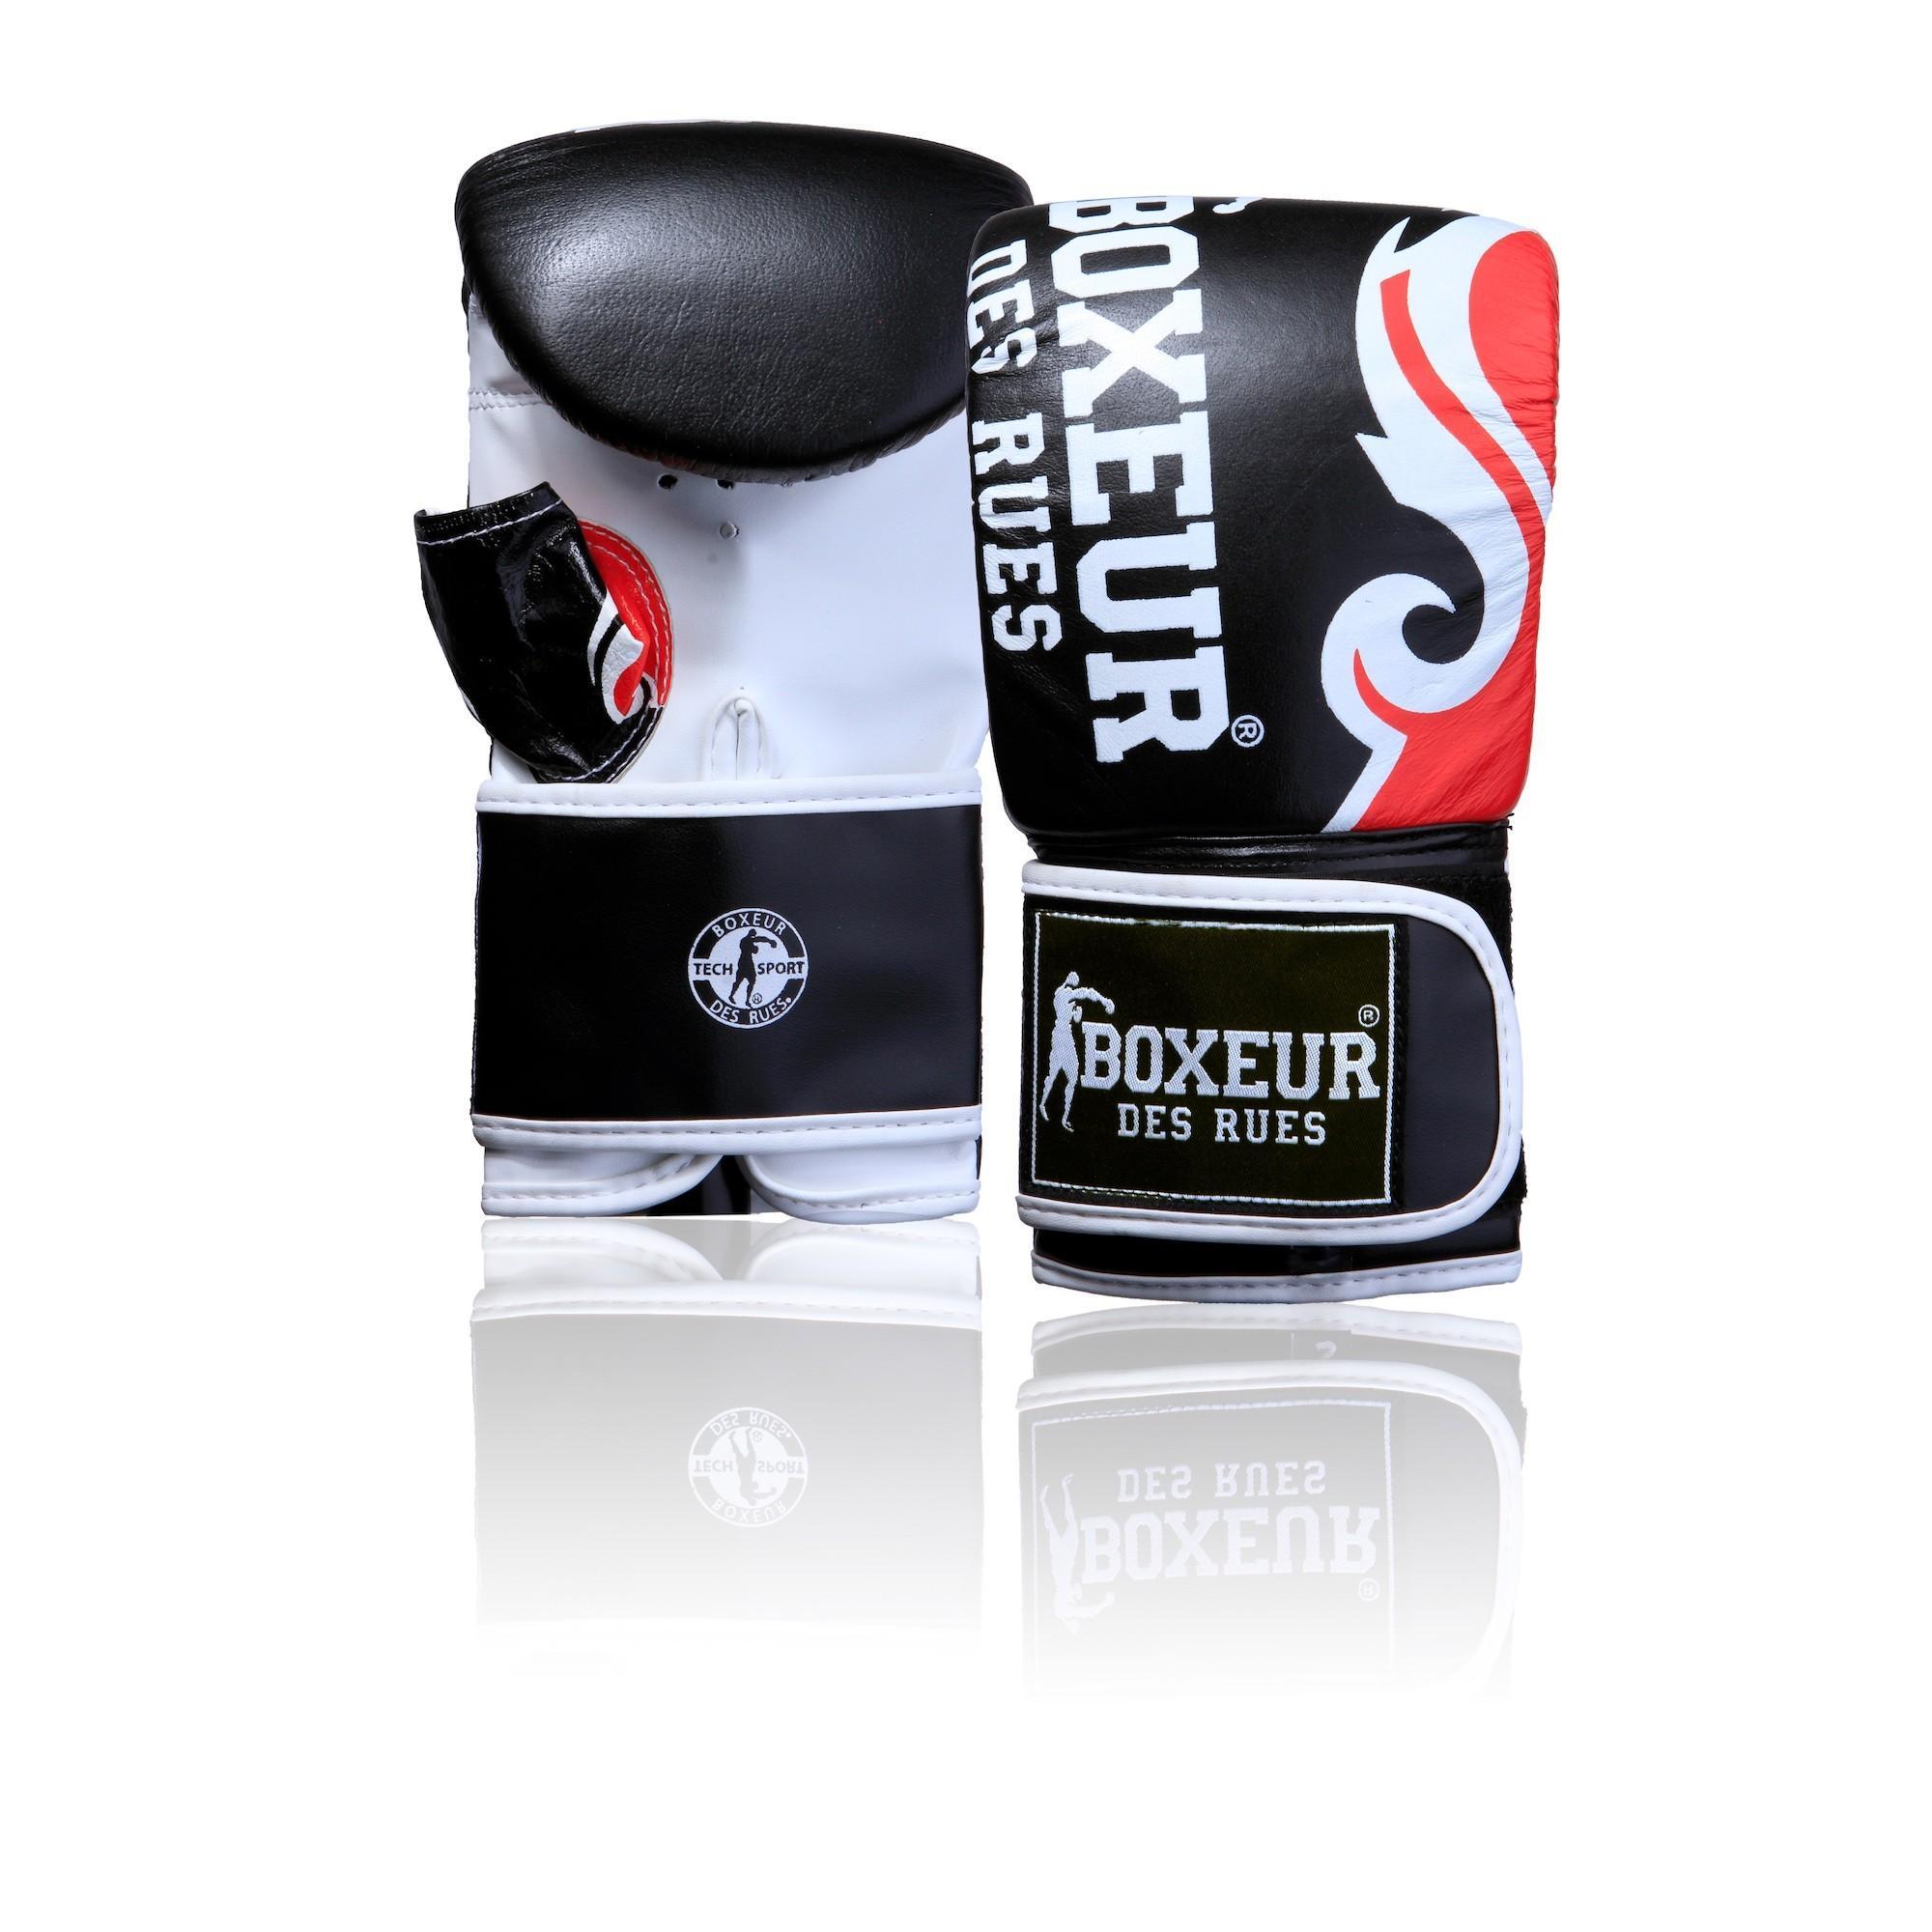 4301296759 Boxeur Des Rues Fight Activewear Guanti da Sacco Tribal